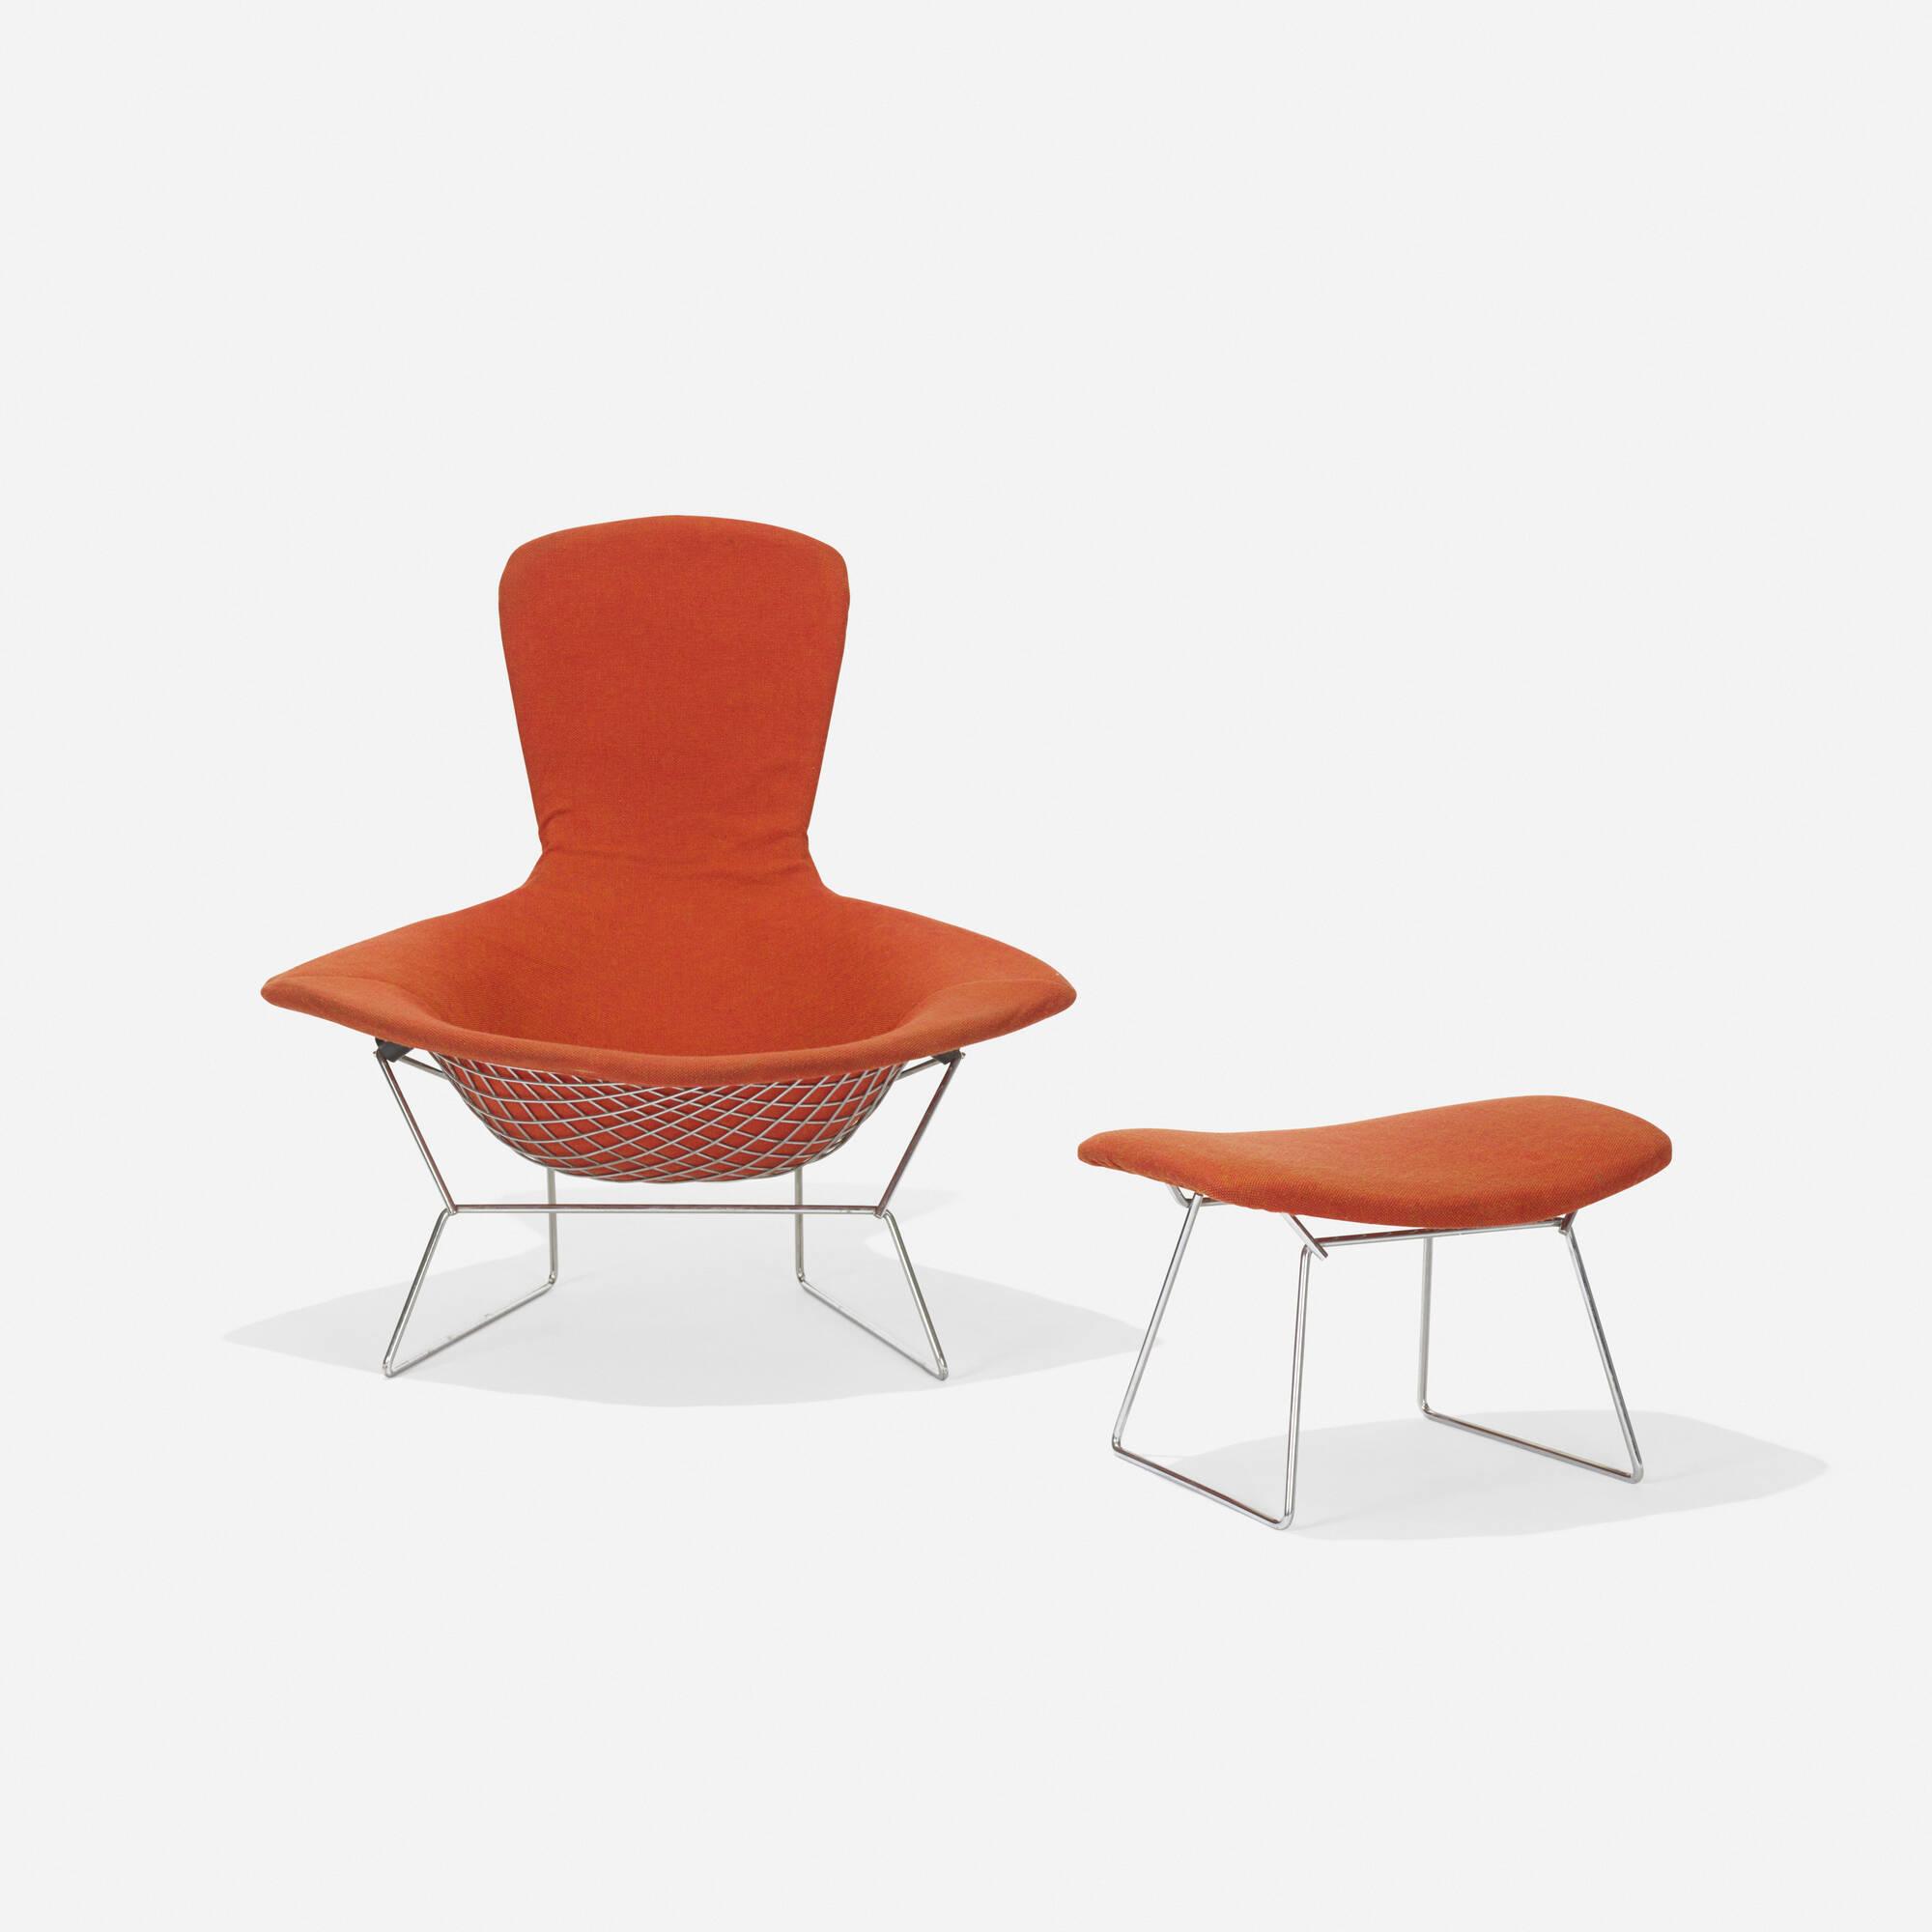 109 Harry Bertoia Bird chair and ottoman American Design 21